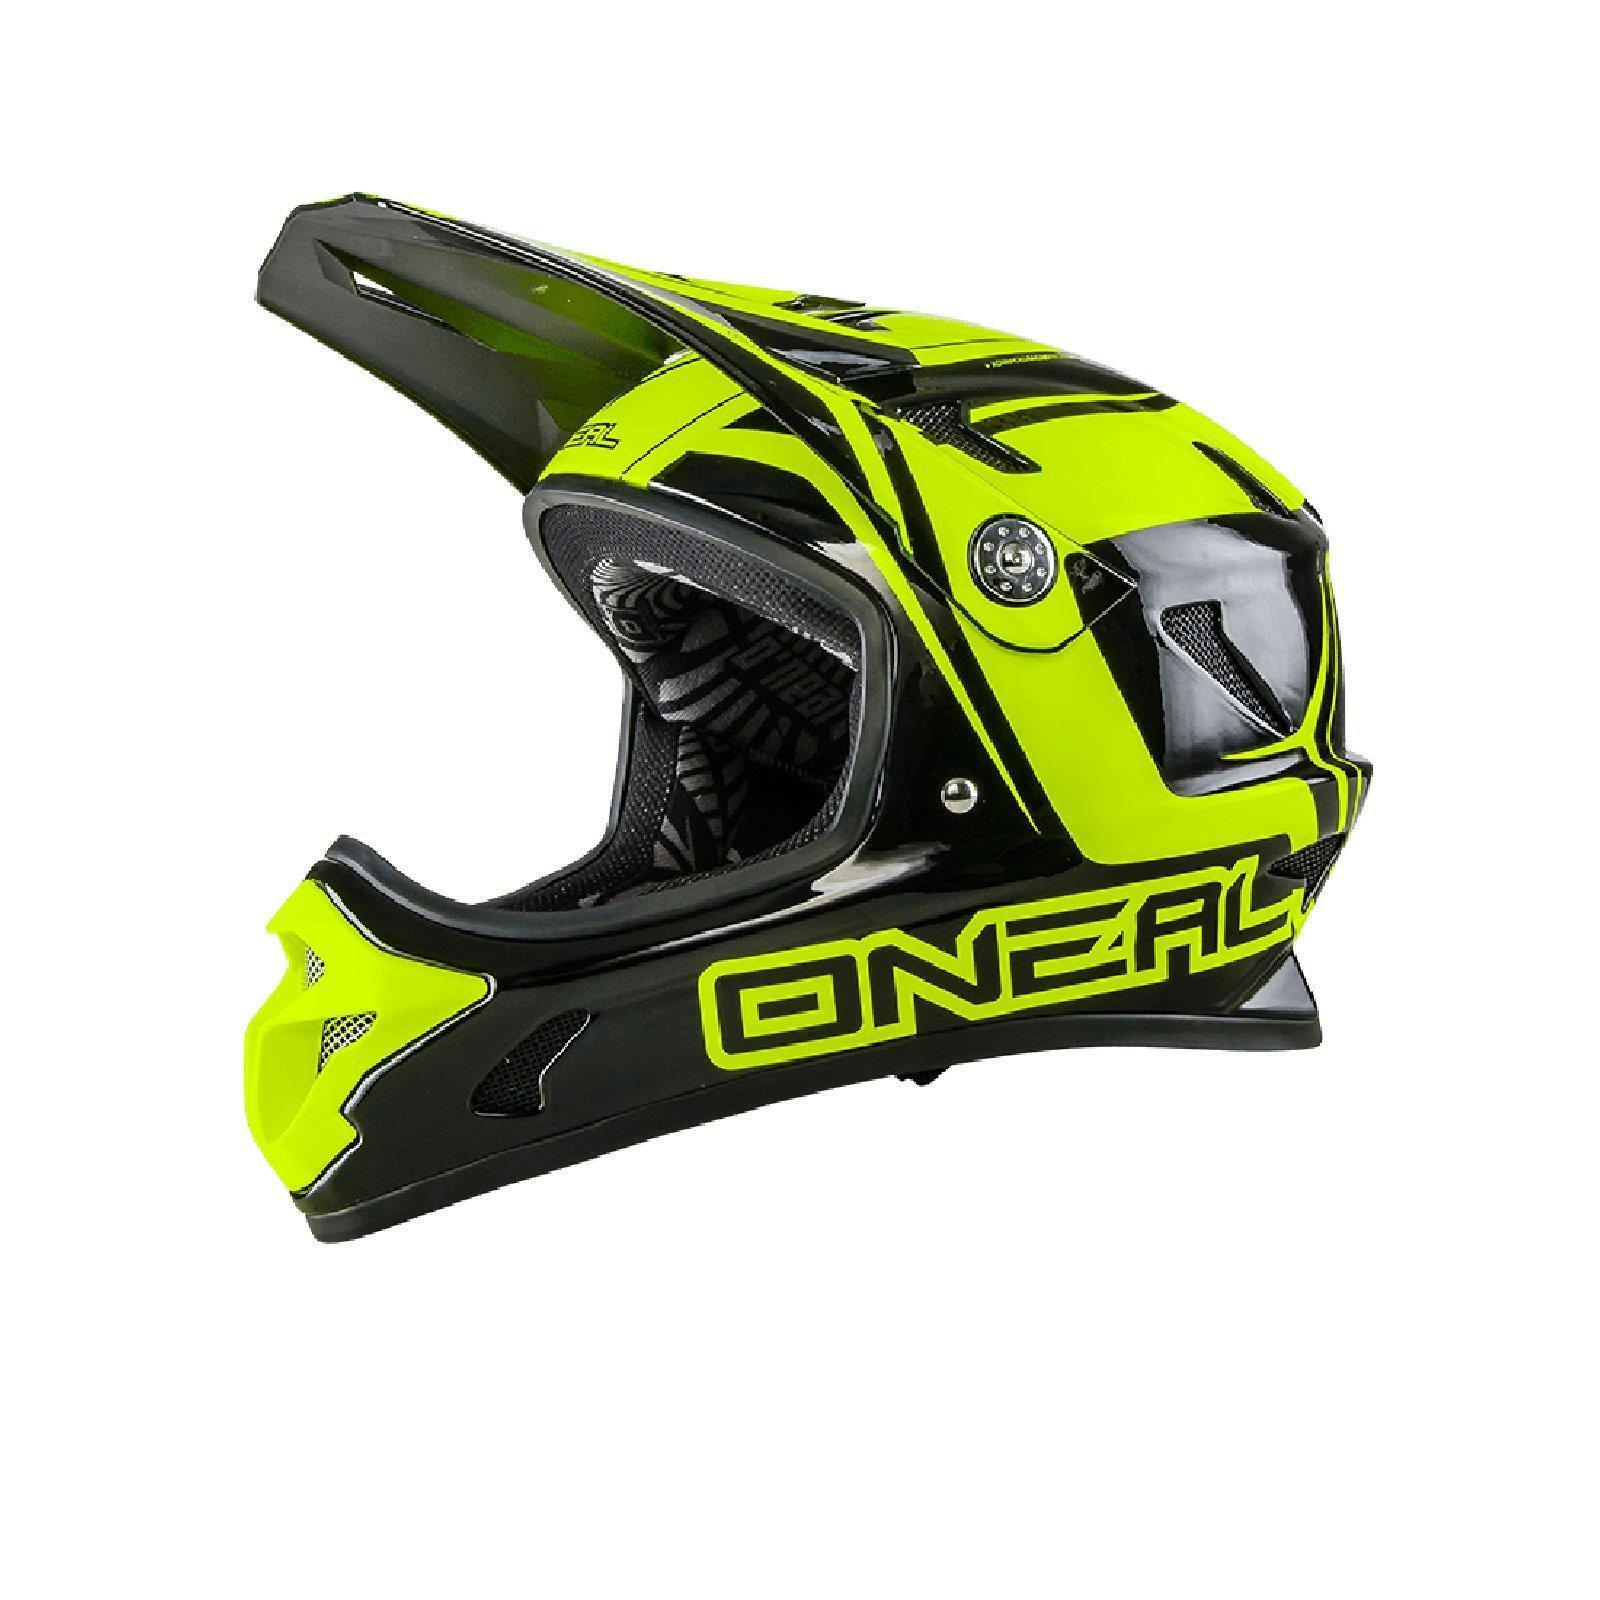 ONeal Spark DH Helm black yellow MTB Fullface Downhill Enduro Mountainbike Trail